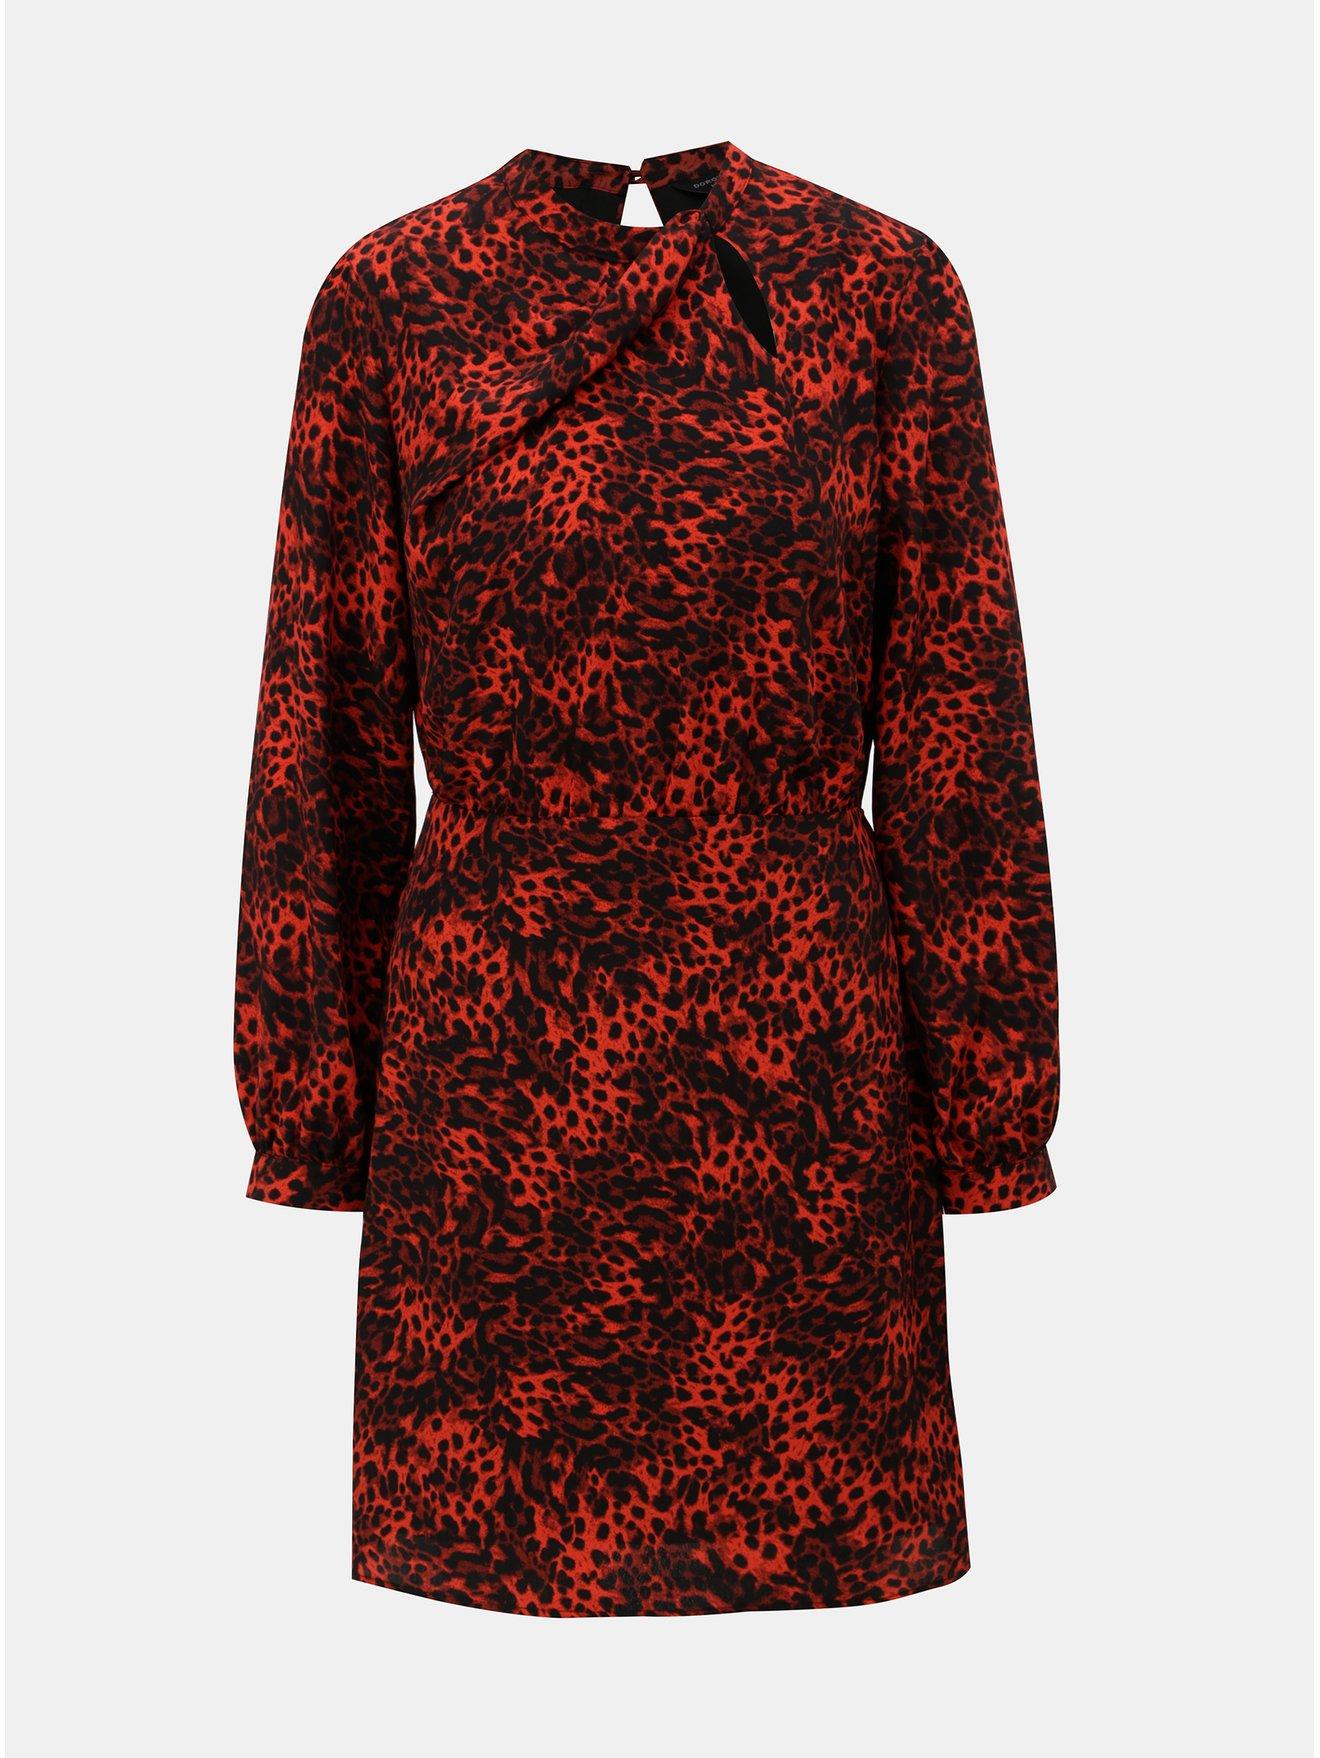 Černo-červené šaty s leopardím vzorem Dorothy Perkins